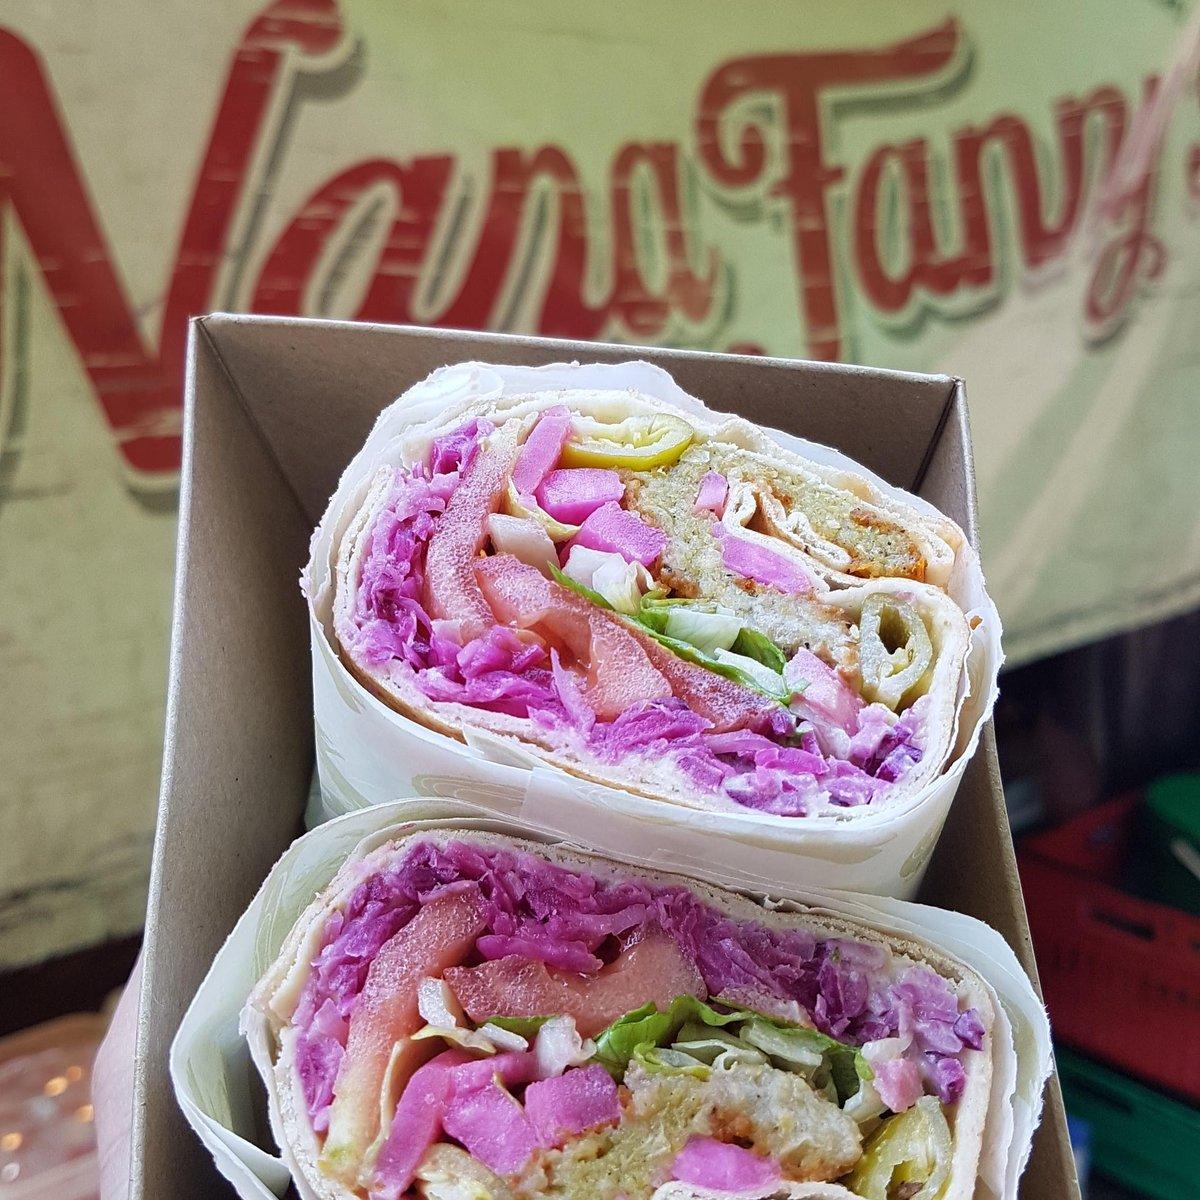 image showing Falafel wraps are available at Borough Market. Award winning falafel suitable for vegan and vegetarians